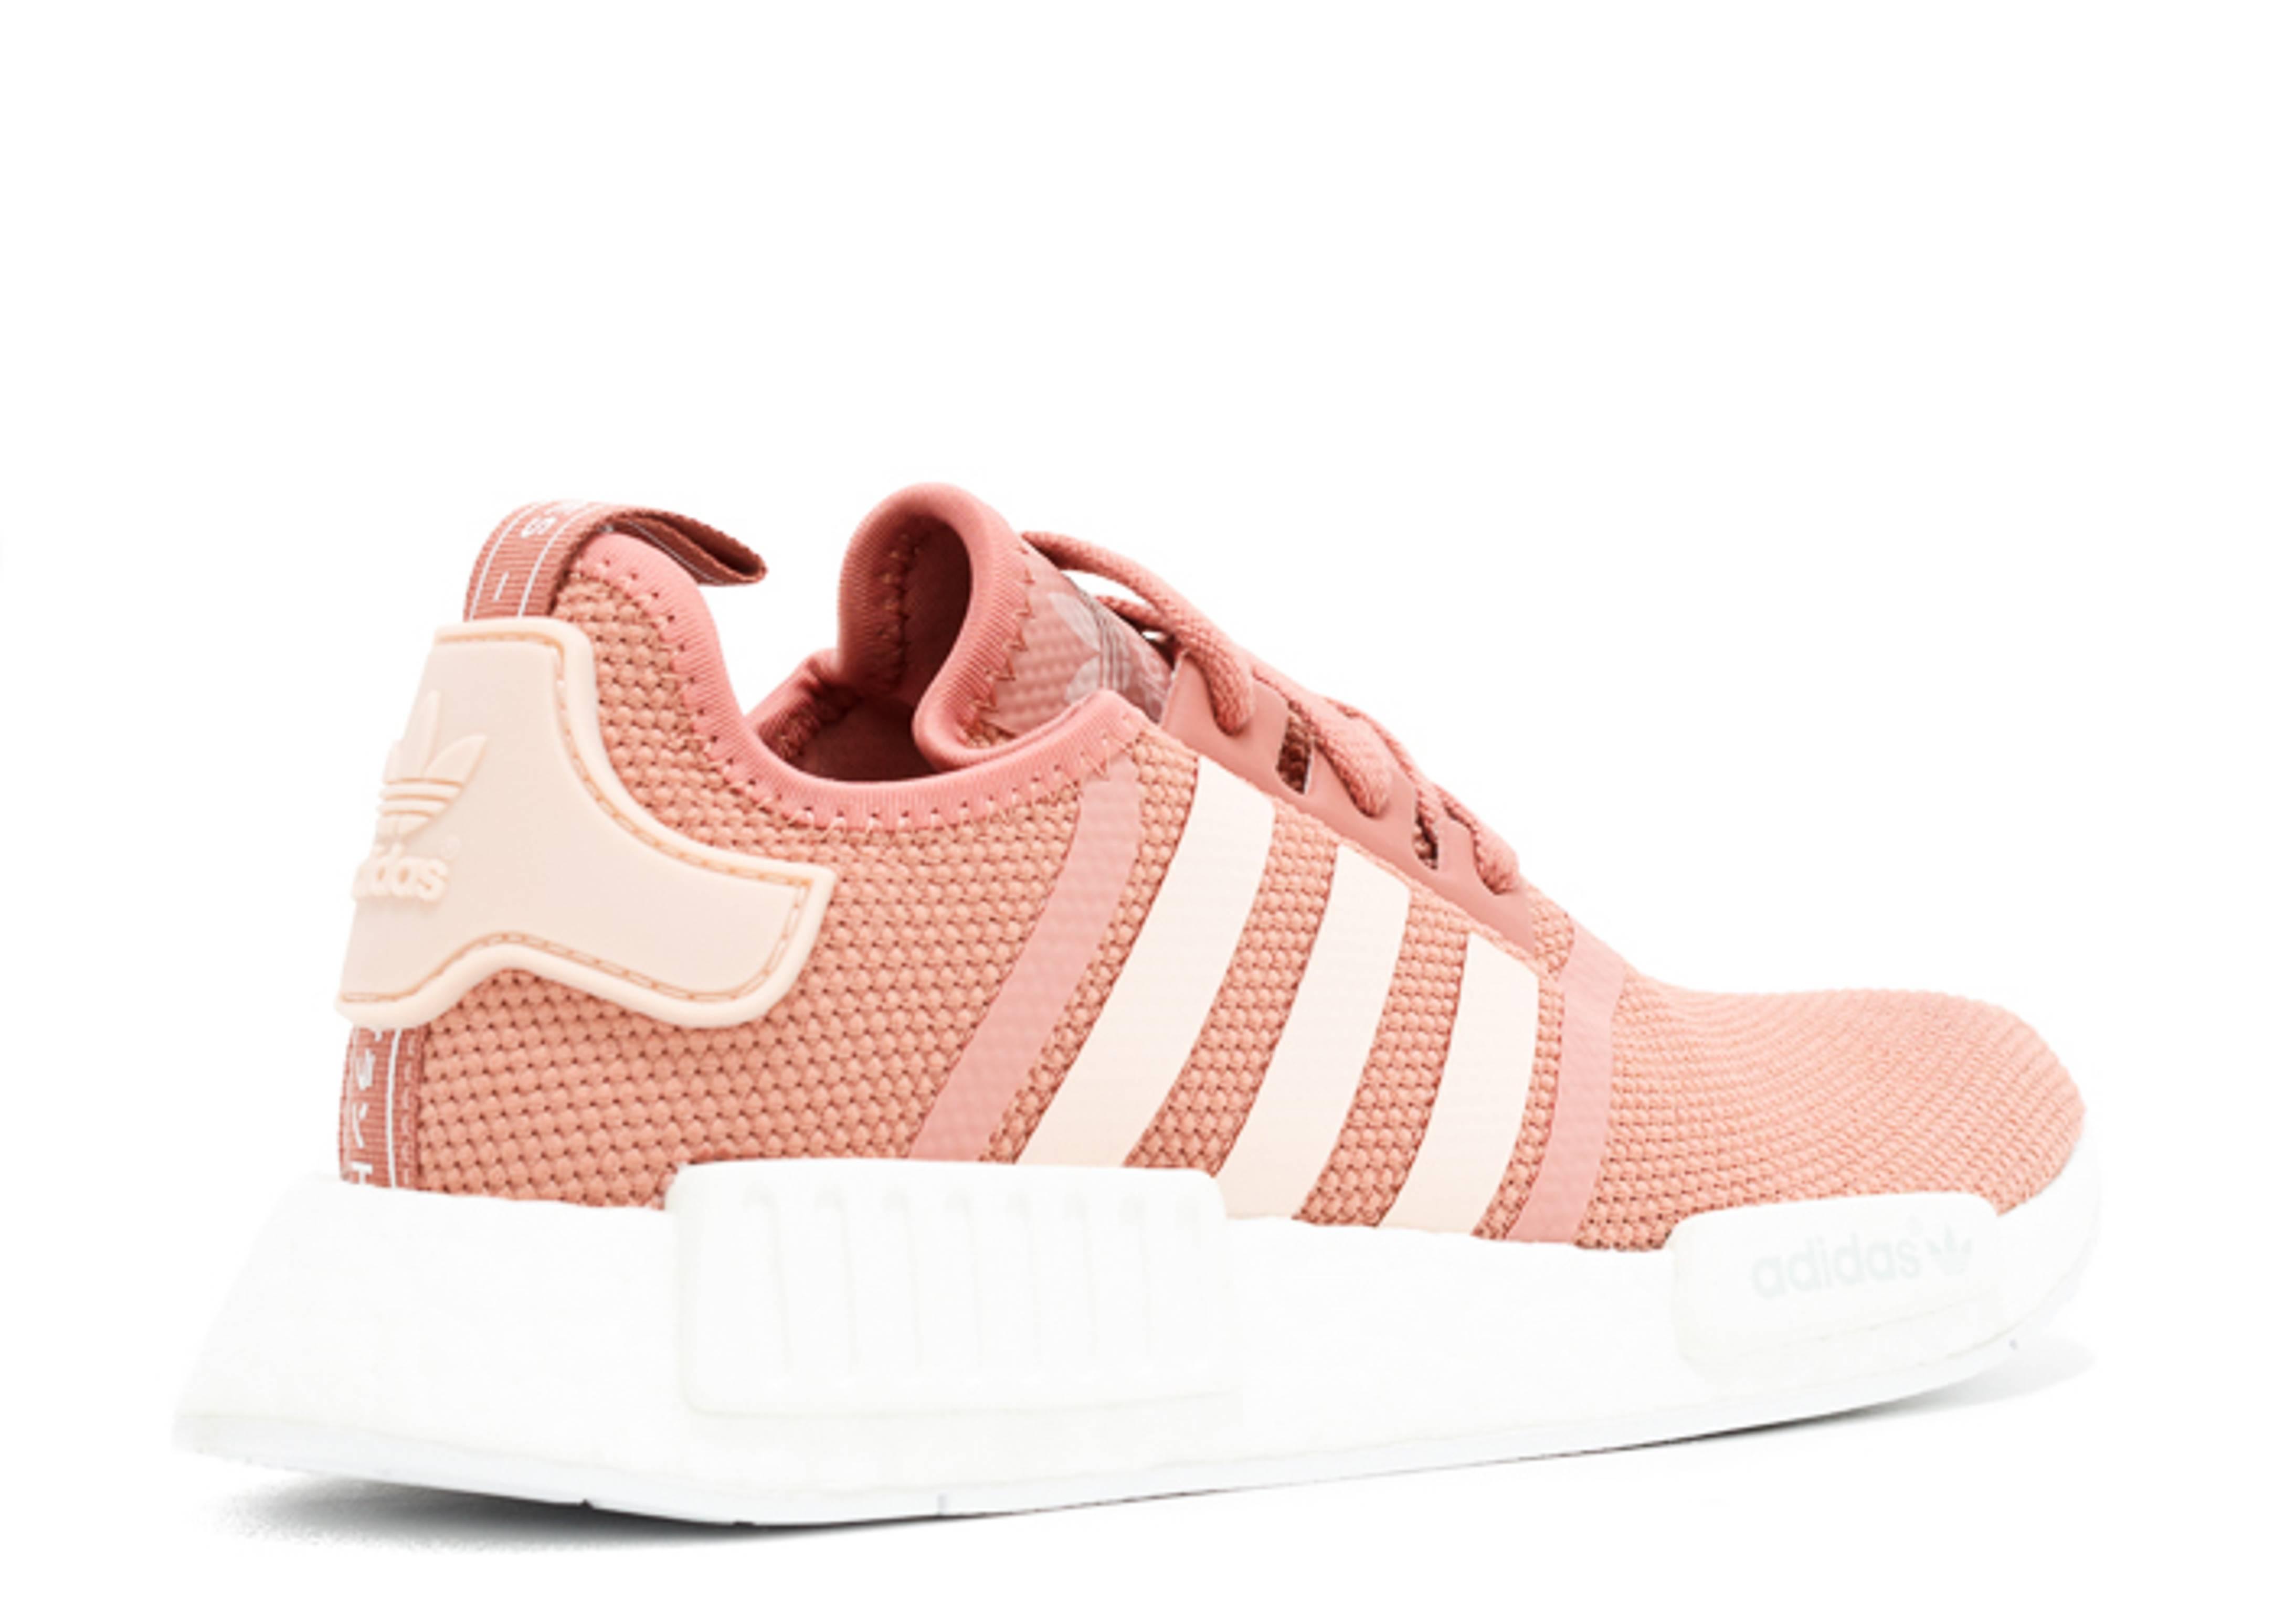 Nmd R1 Adidas Pink